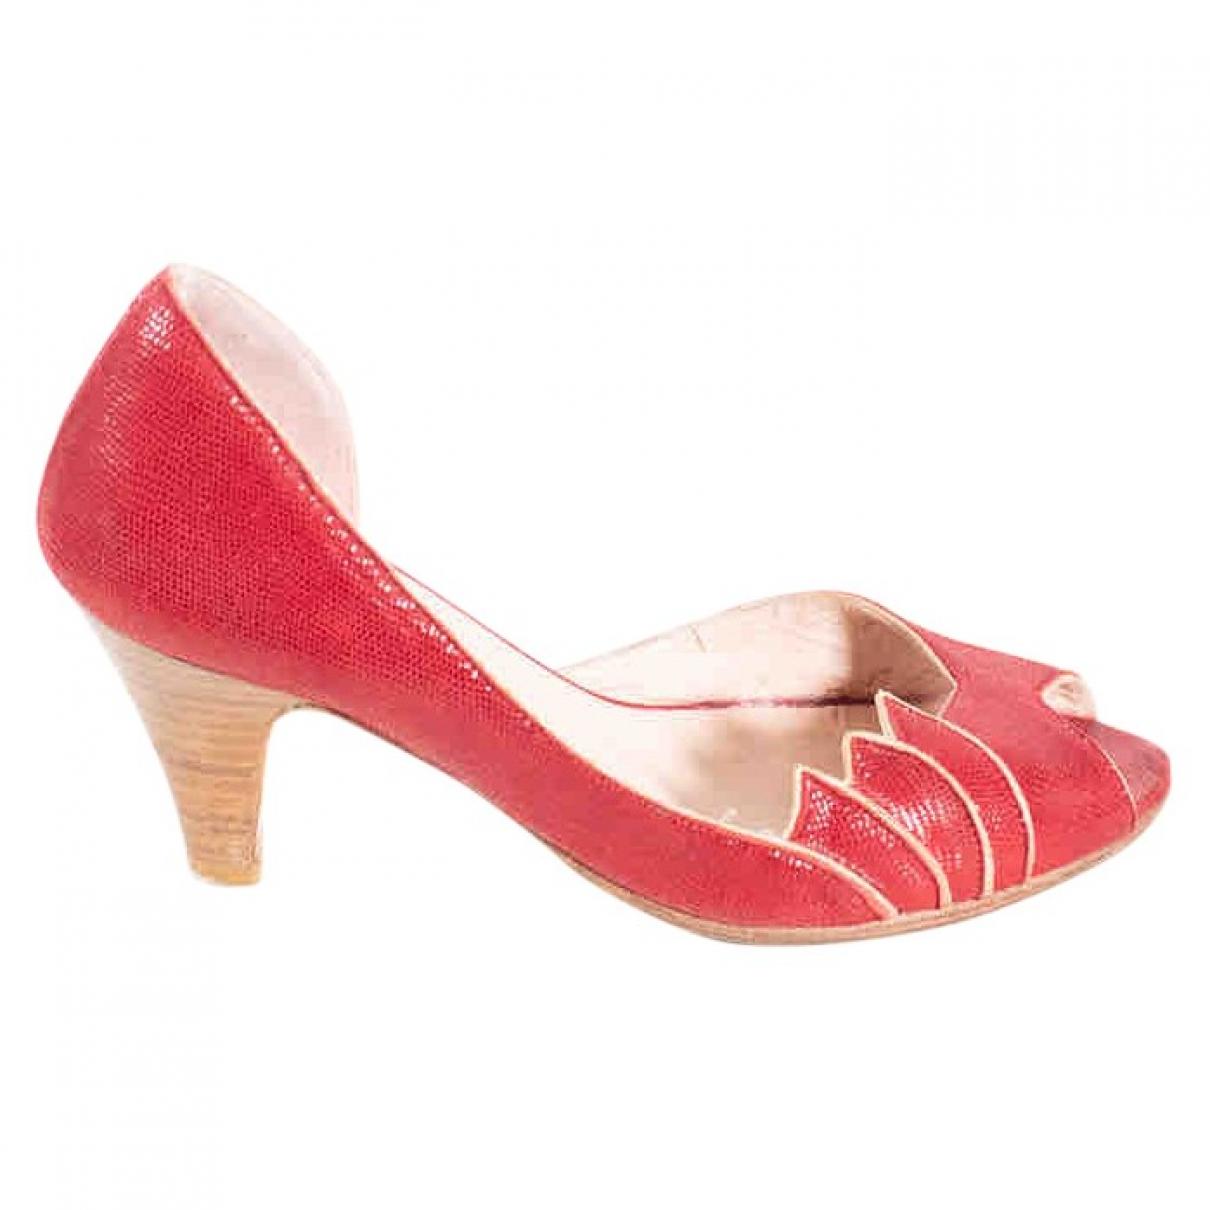 Patricia Blanchet \N Pumps in  Rot Leder